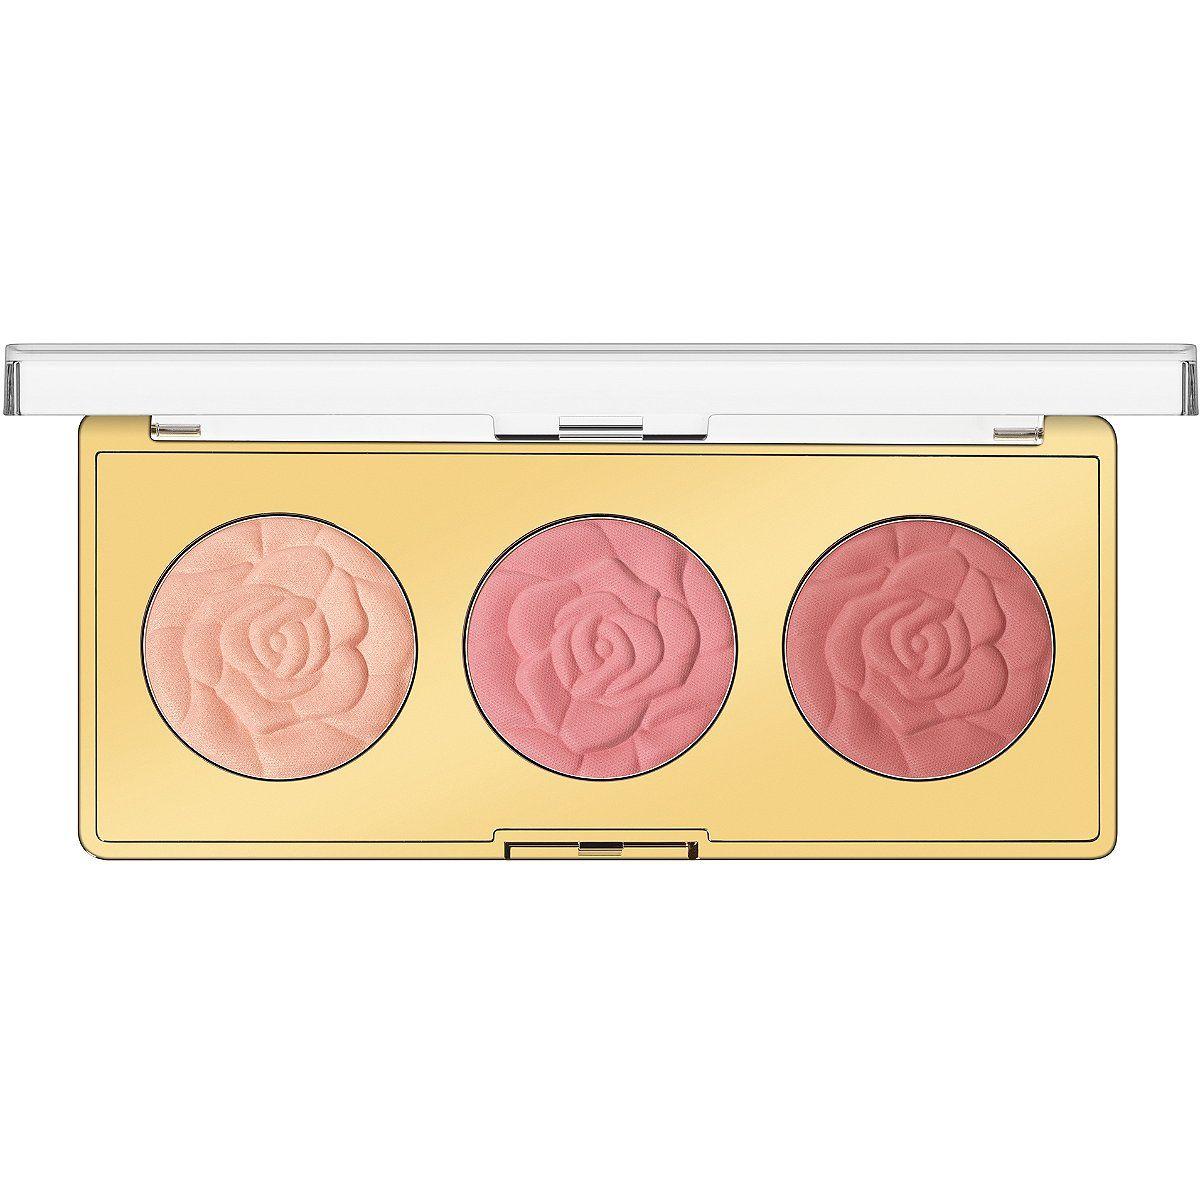 Milani Rose Blush Trio Palette Ulta Beauty in 2020